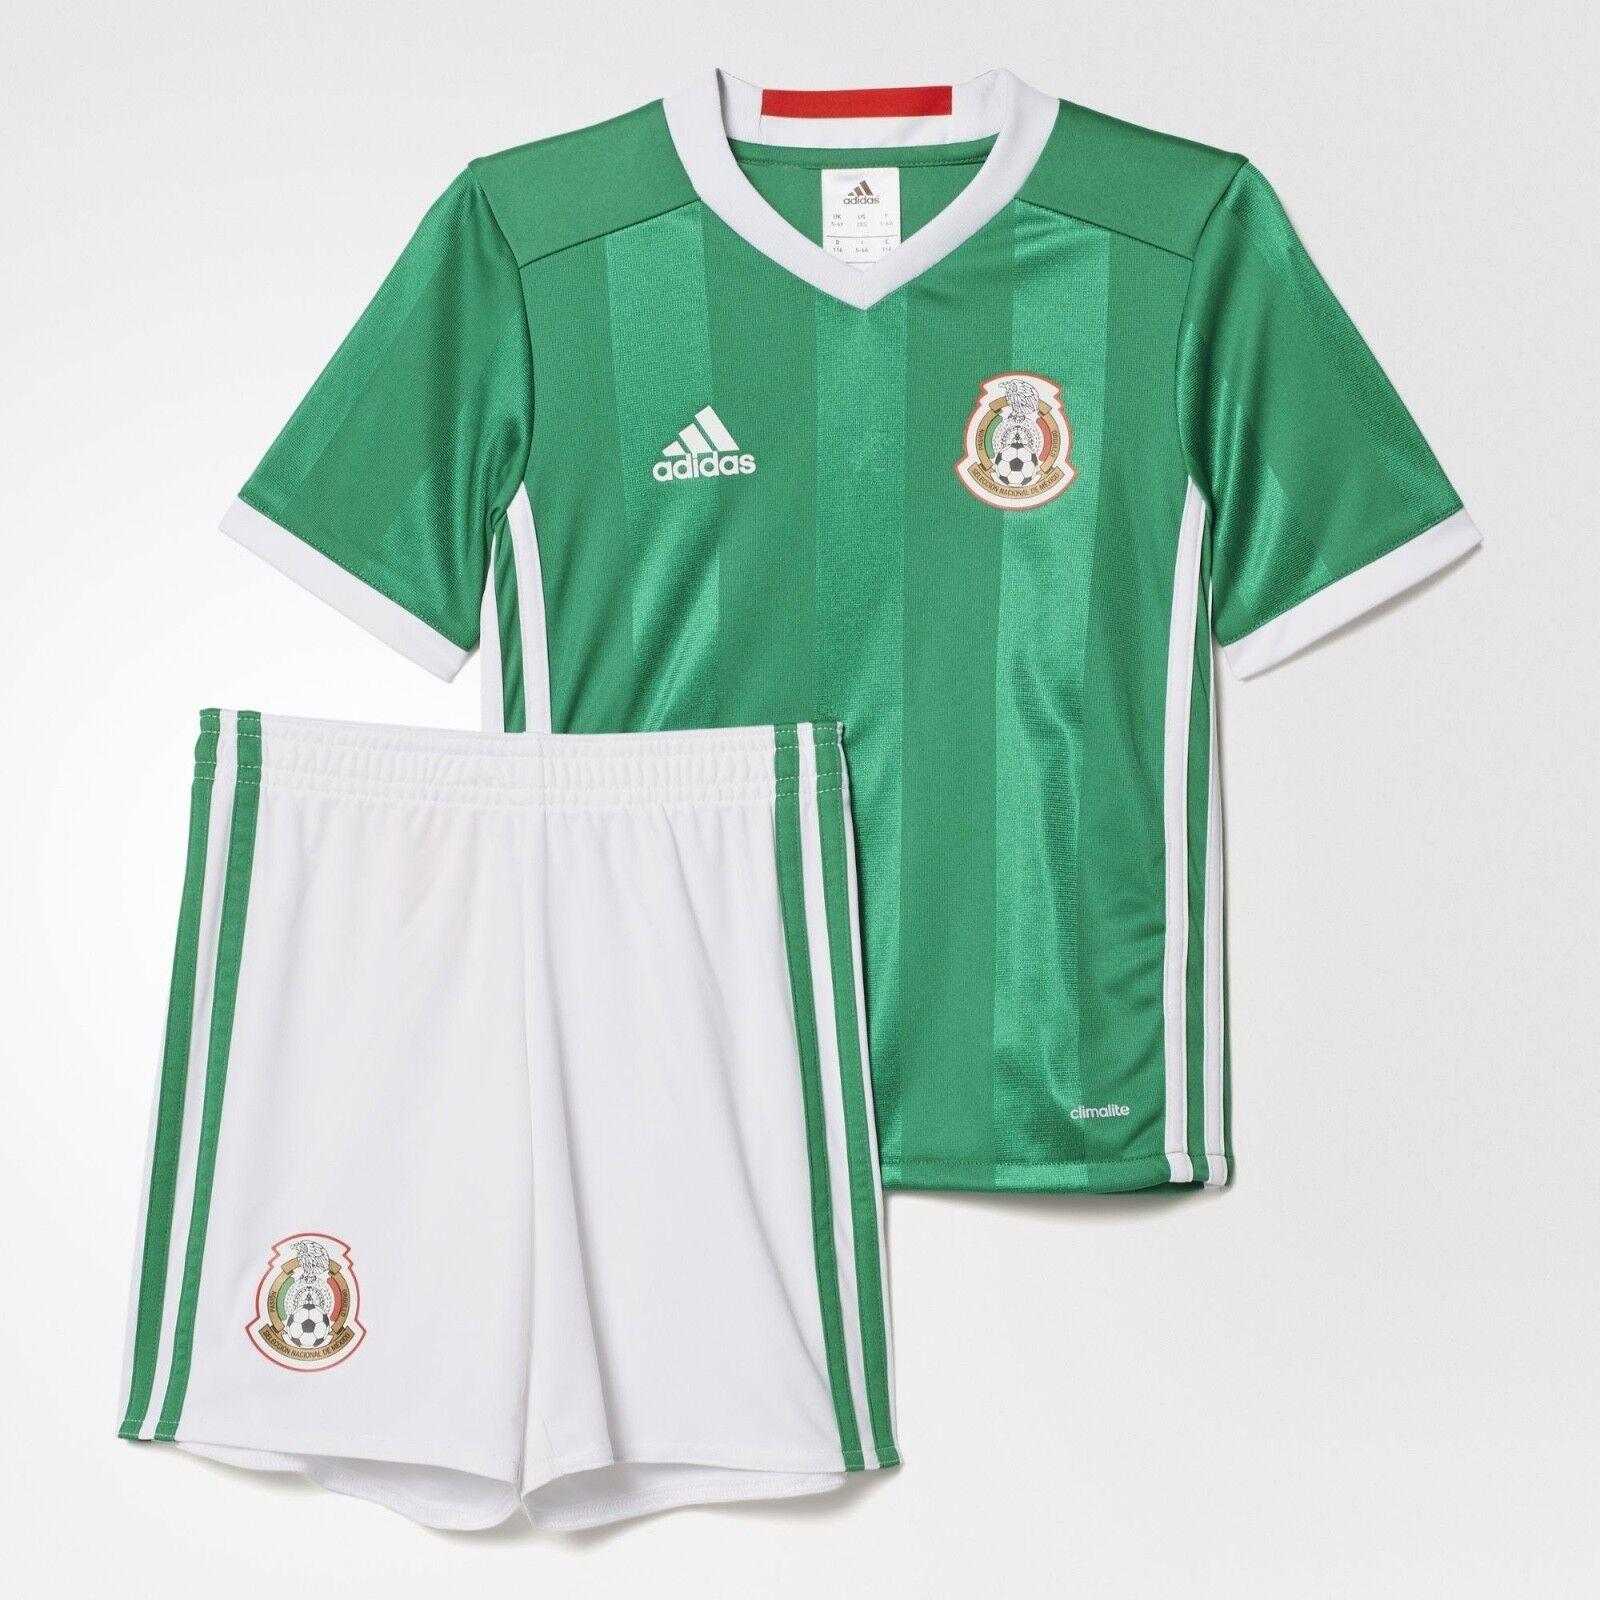 0b4a37f0a KIT BOYS KIDS ADIDAS NATIONAL TEAM SHORTS SOCCER MEXICO JERSEY ...